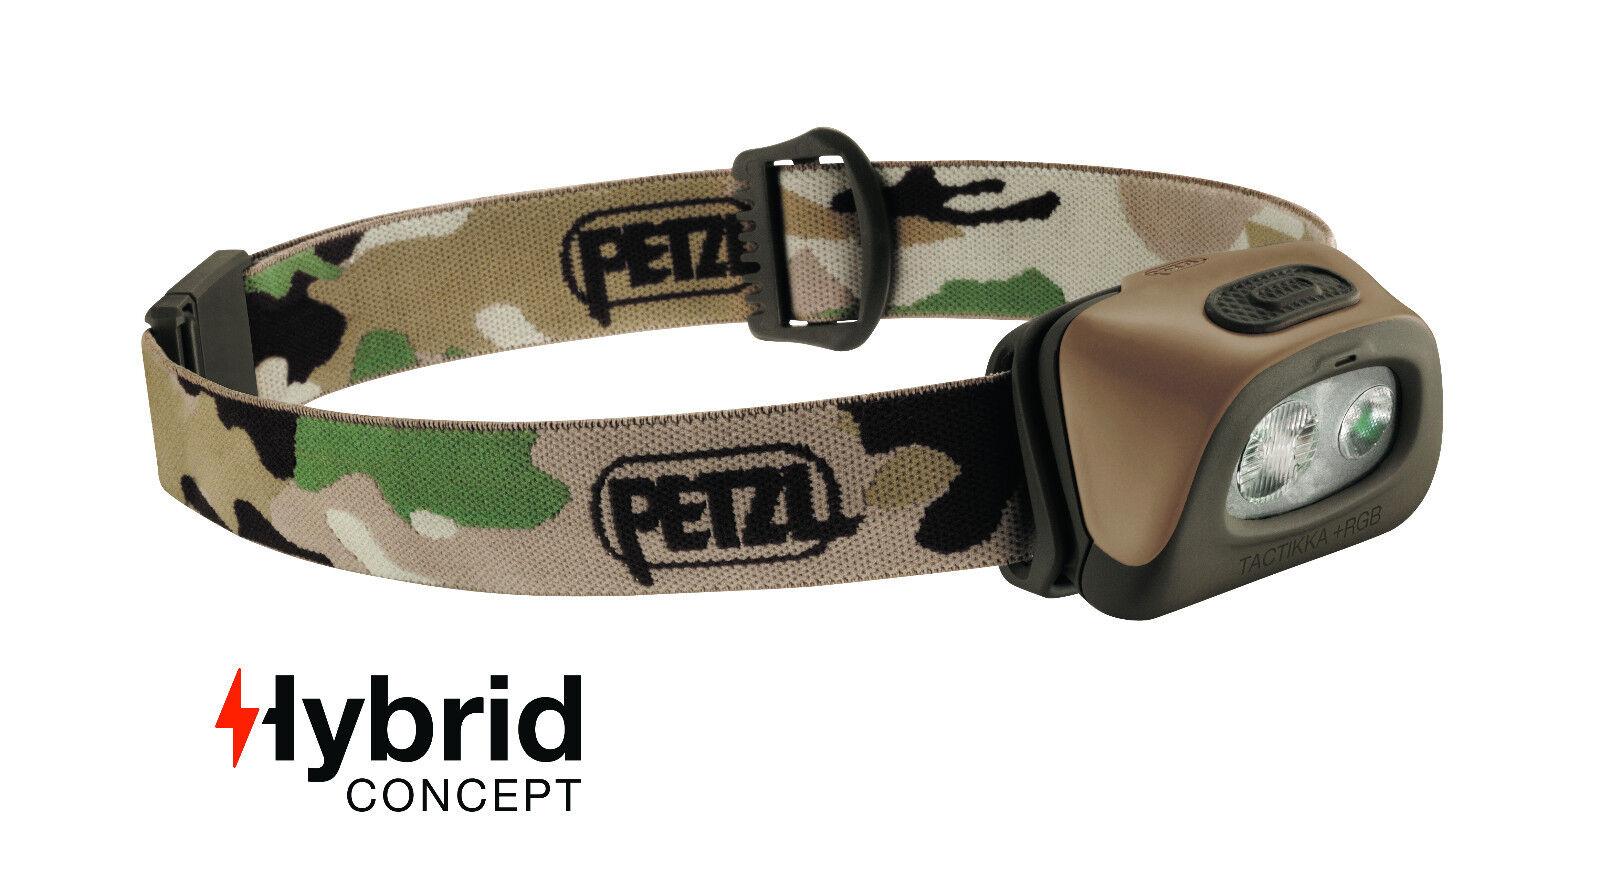 Petzl Headlamp - TACTIKKA + RGB (red, green, bluee) 250 lumens